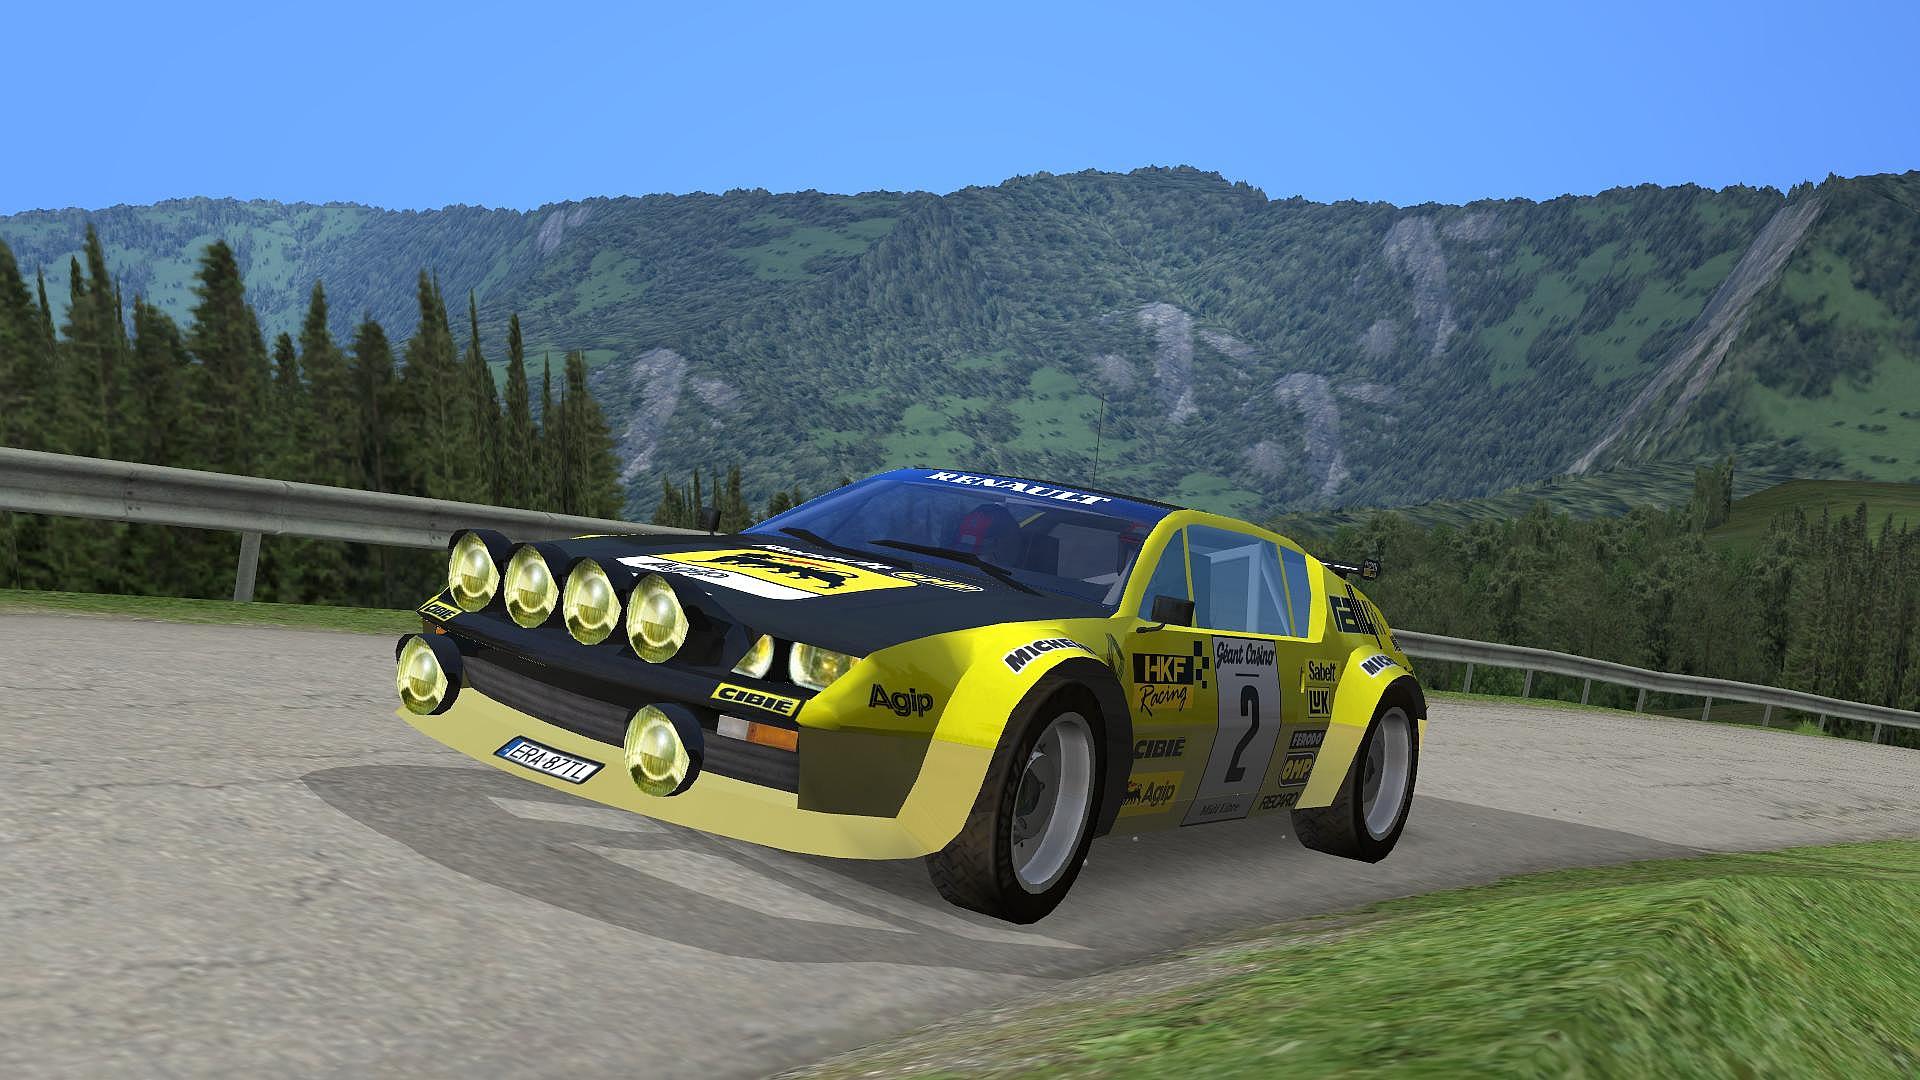 Alpine a310